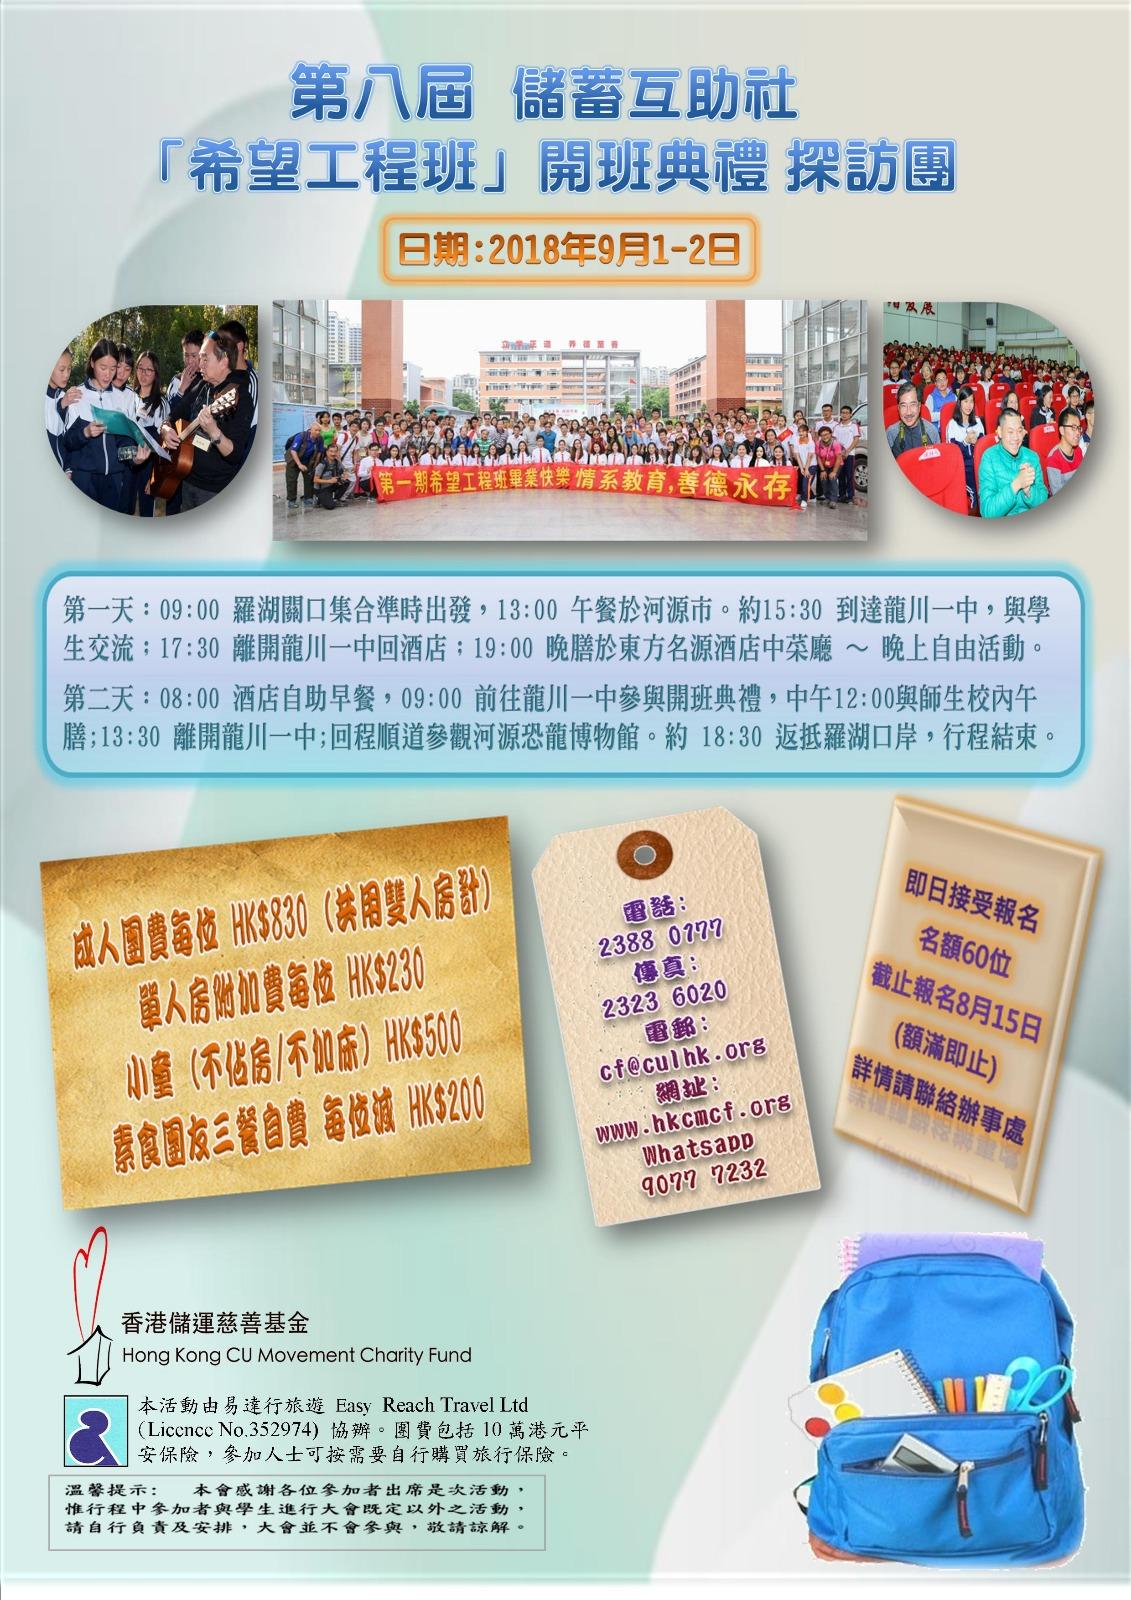 http://home.culhk.org/files/HKCMCF/20180901-poster.jpg